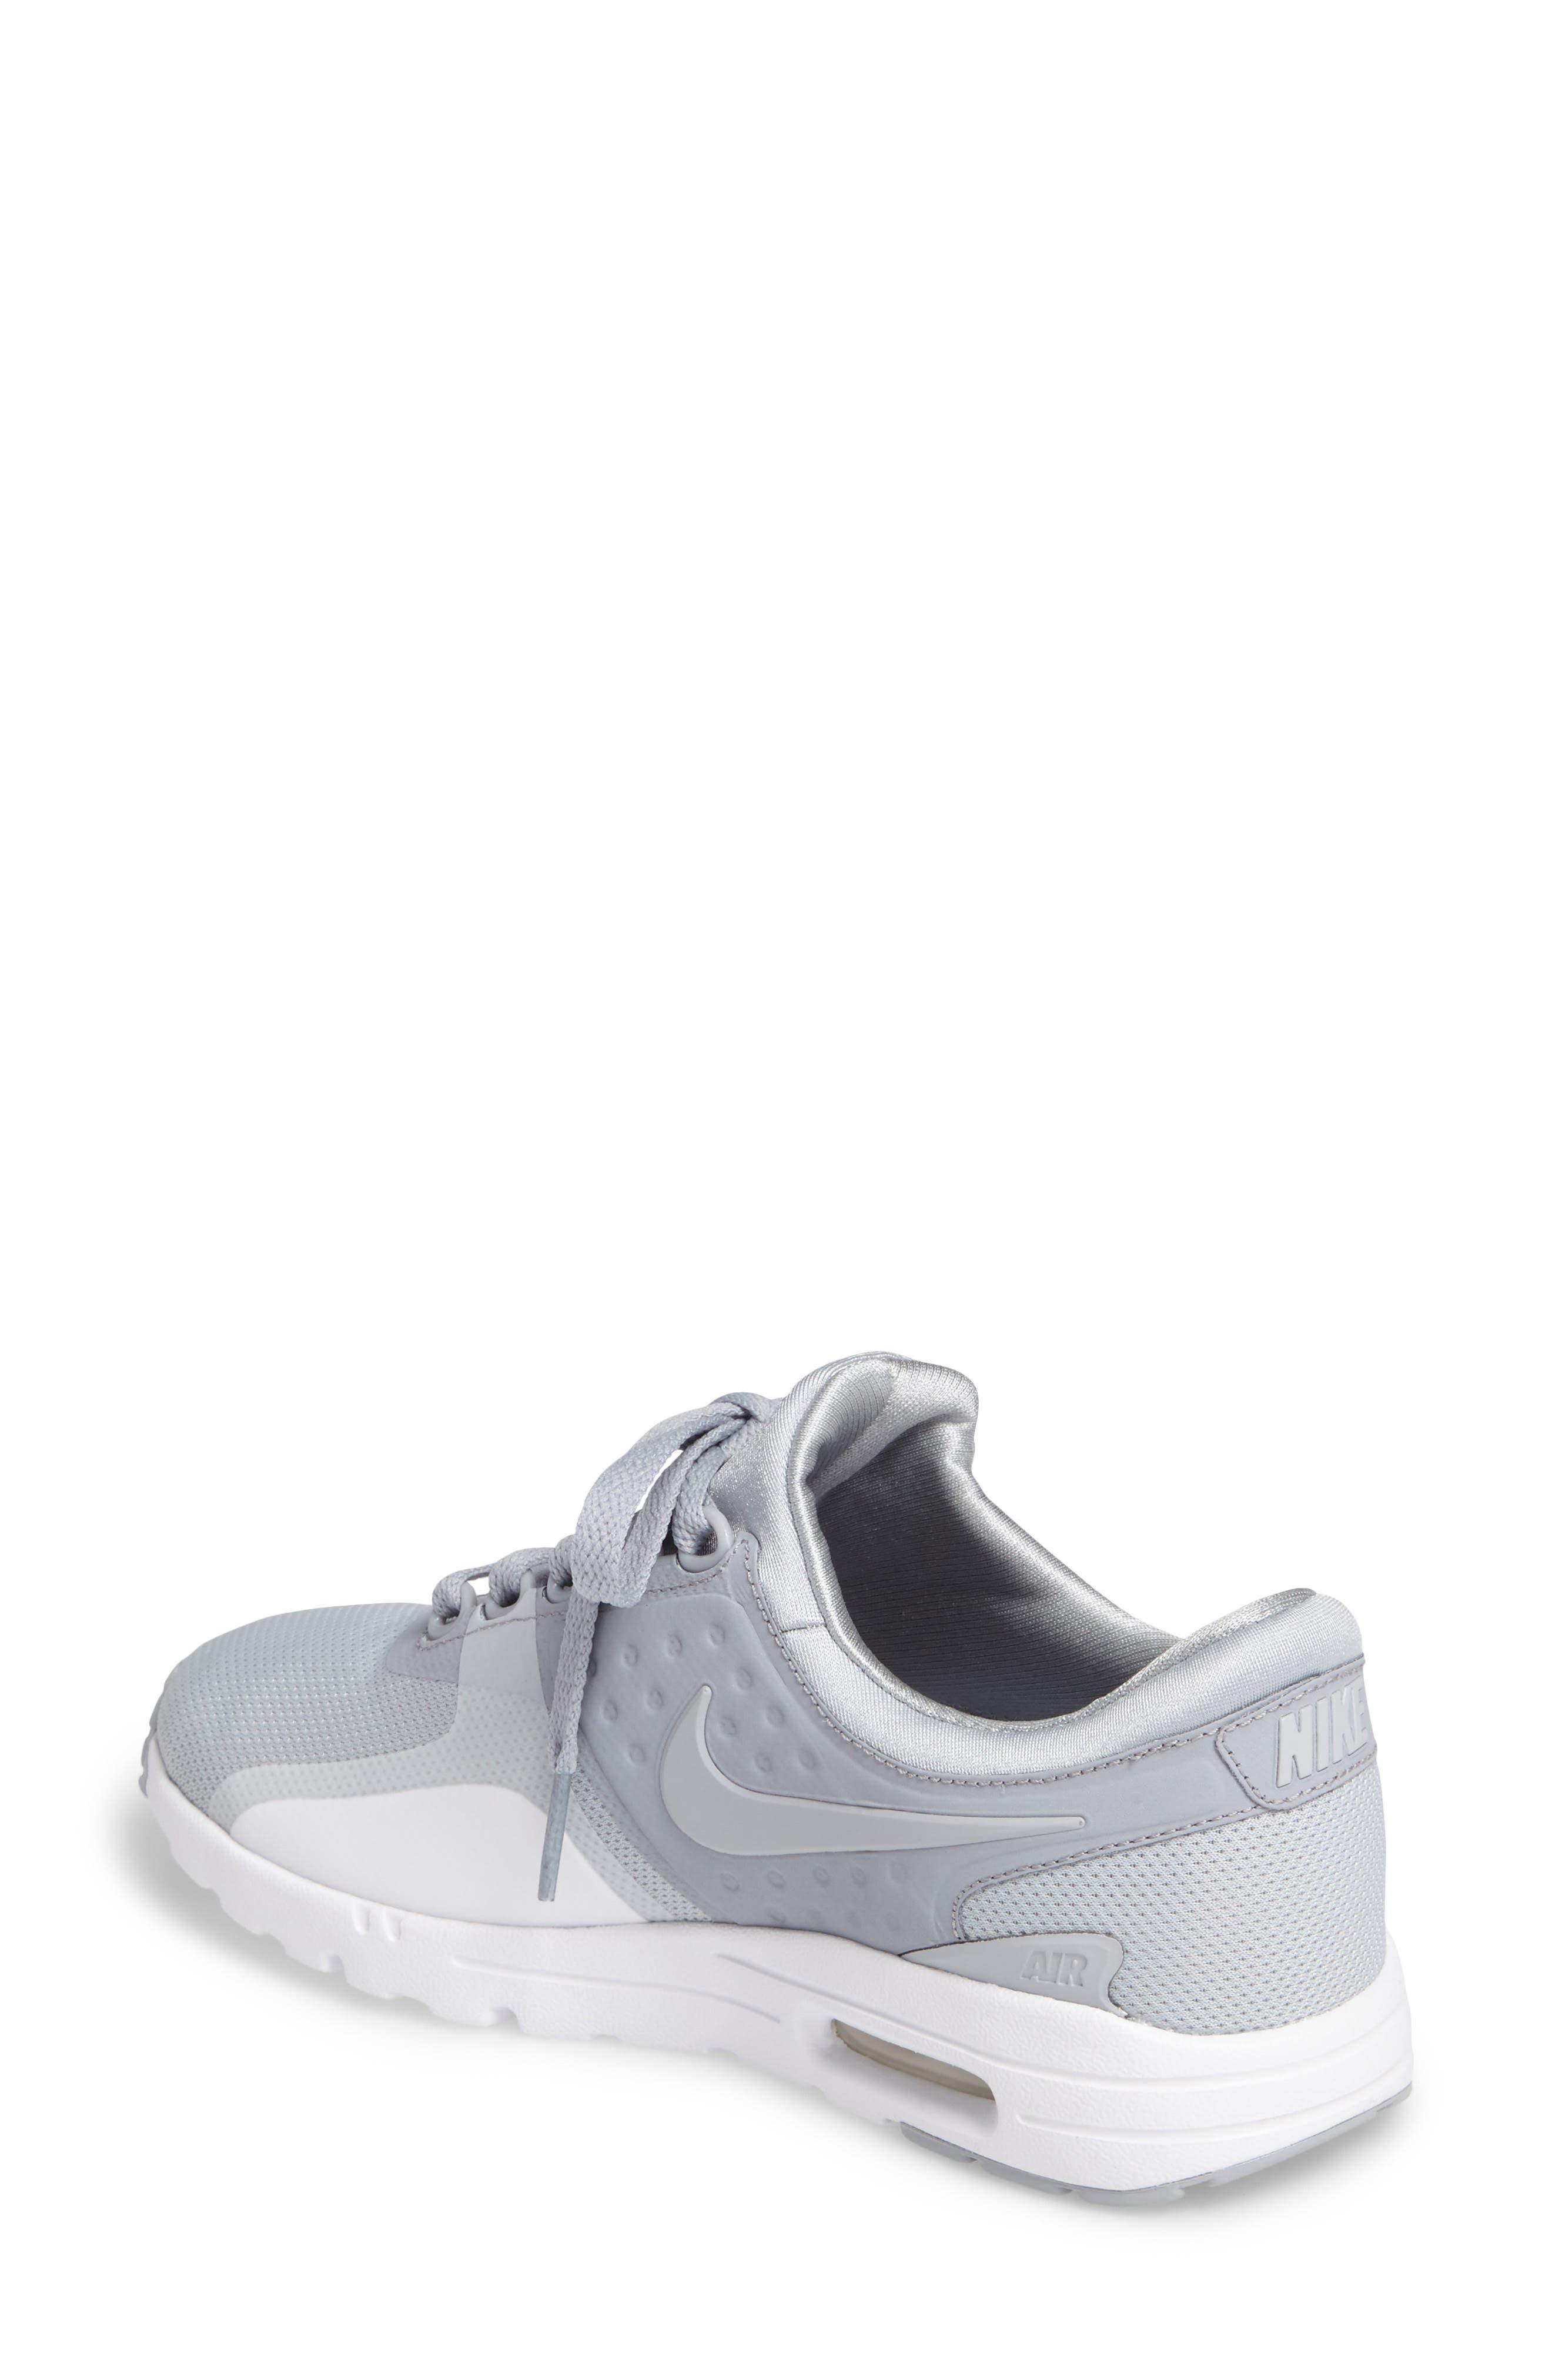 Air Max Zero Sneaker,                             Alternate thumbnail 2, color,                             020